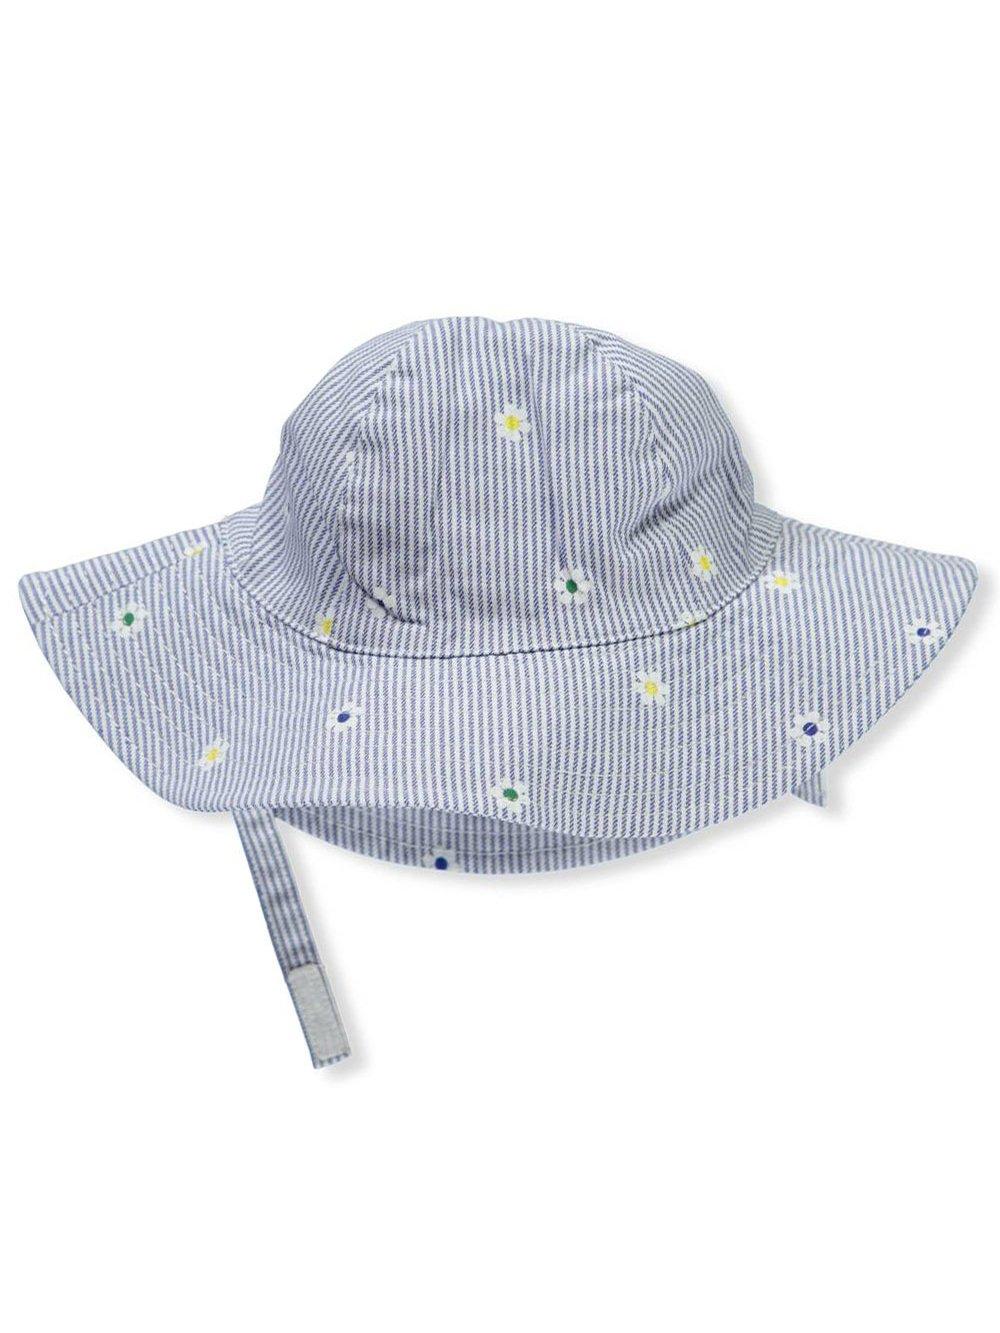 b87f1e8ad9579 Carter s Baby Girls  Bucket Hat - blue